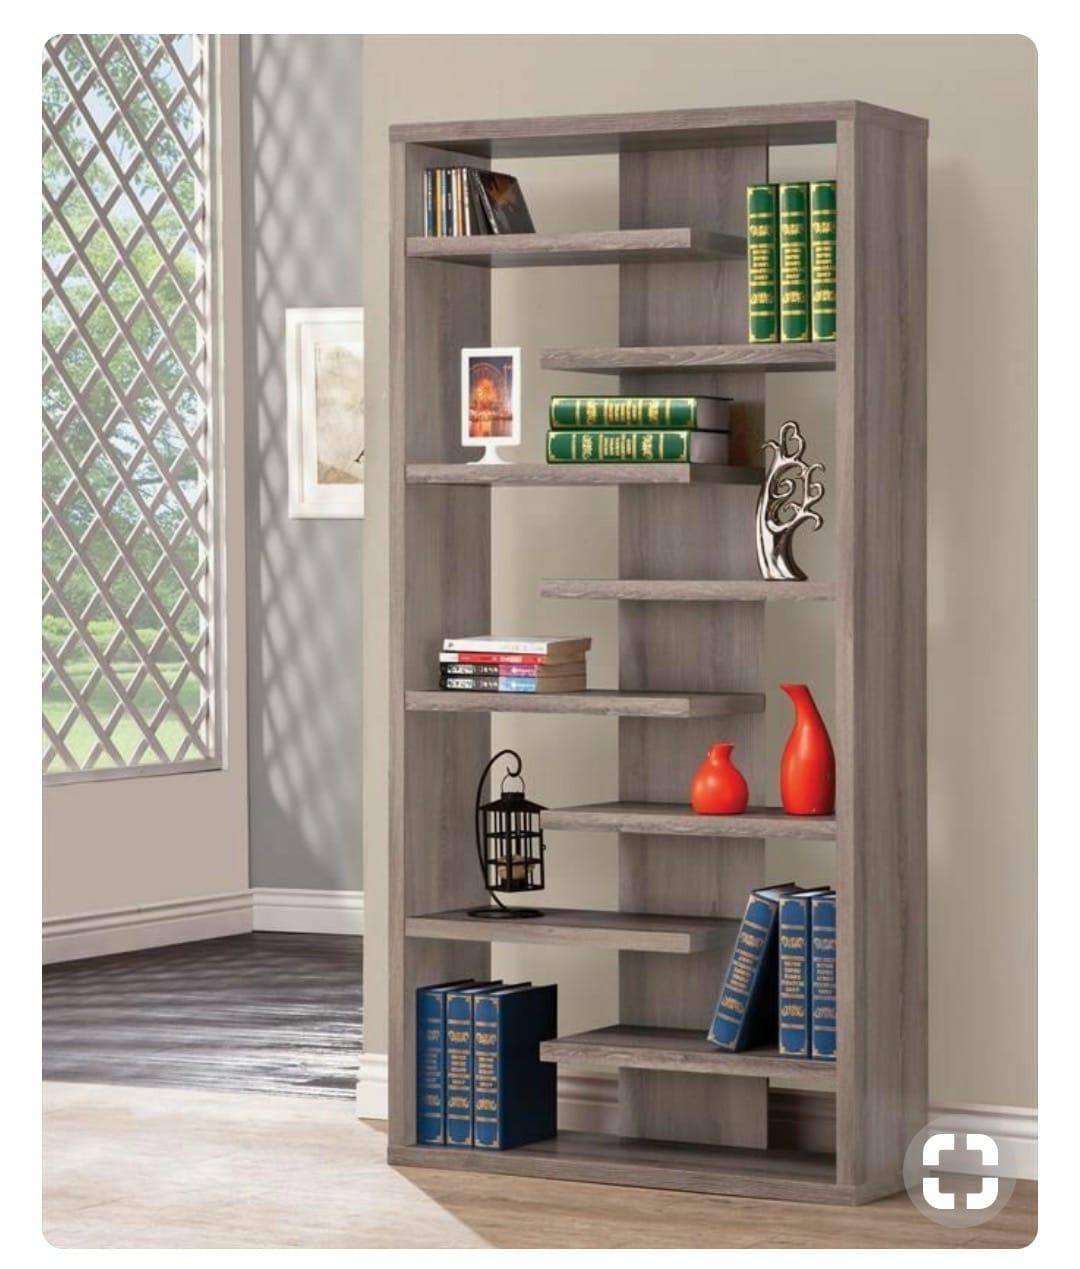 Lucky Furniture, Modern book shelves in Zirakpur, wooden book rack design in zrk, book shelf almirah, wall book shelf, bookshelf on wall, simple bookshelf design